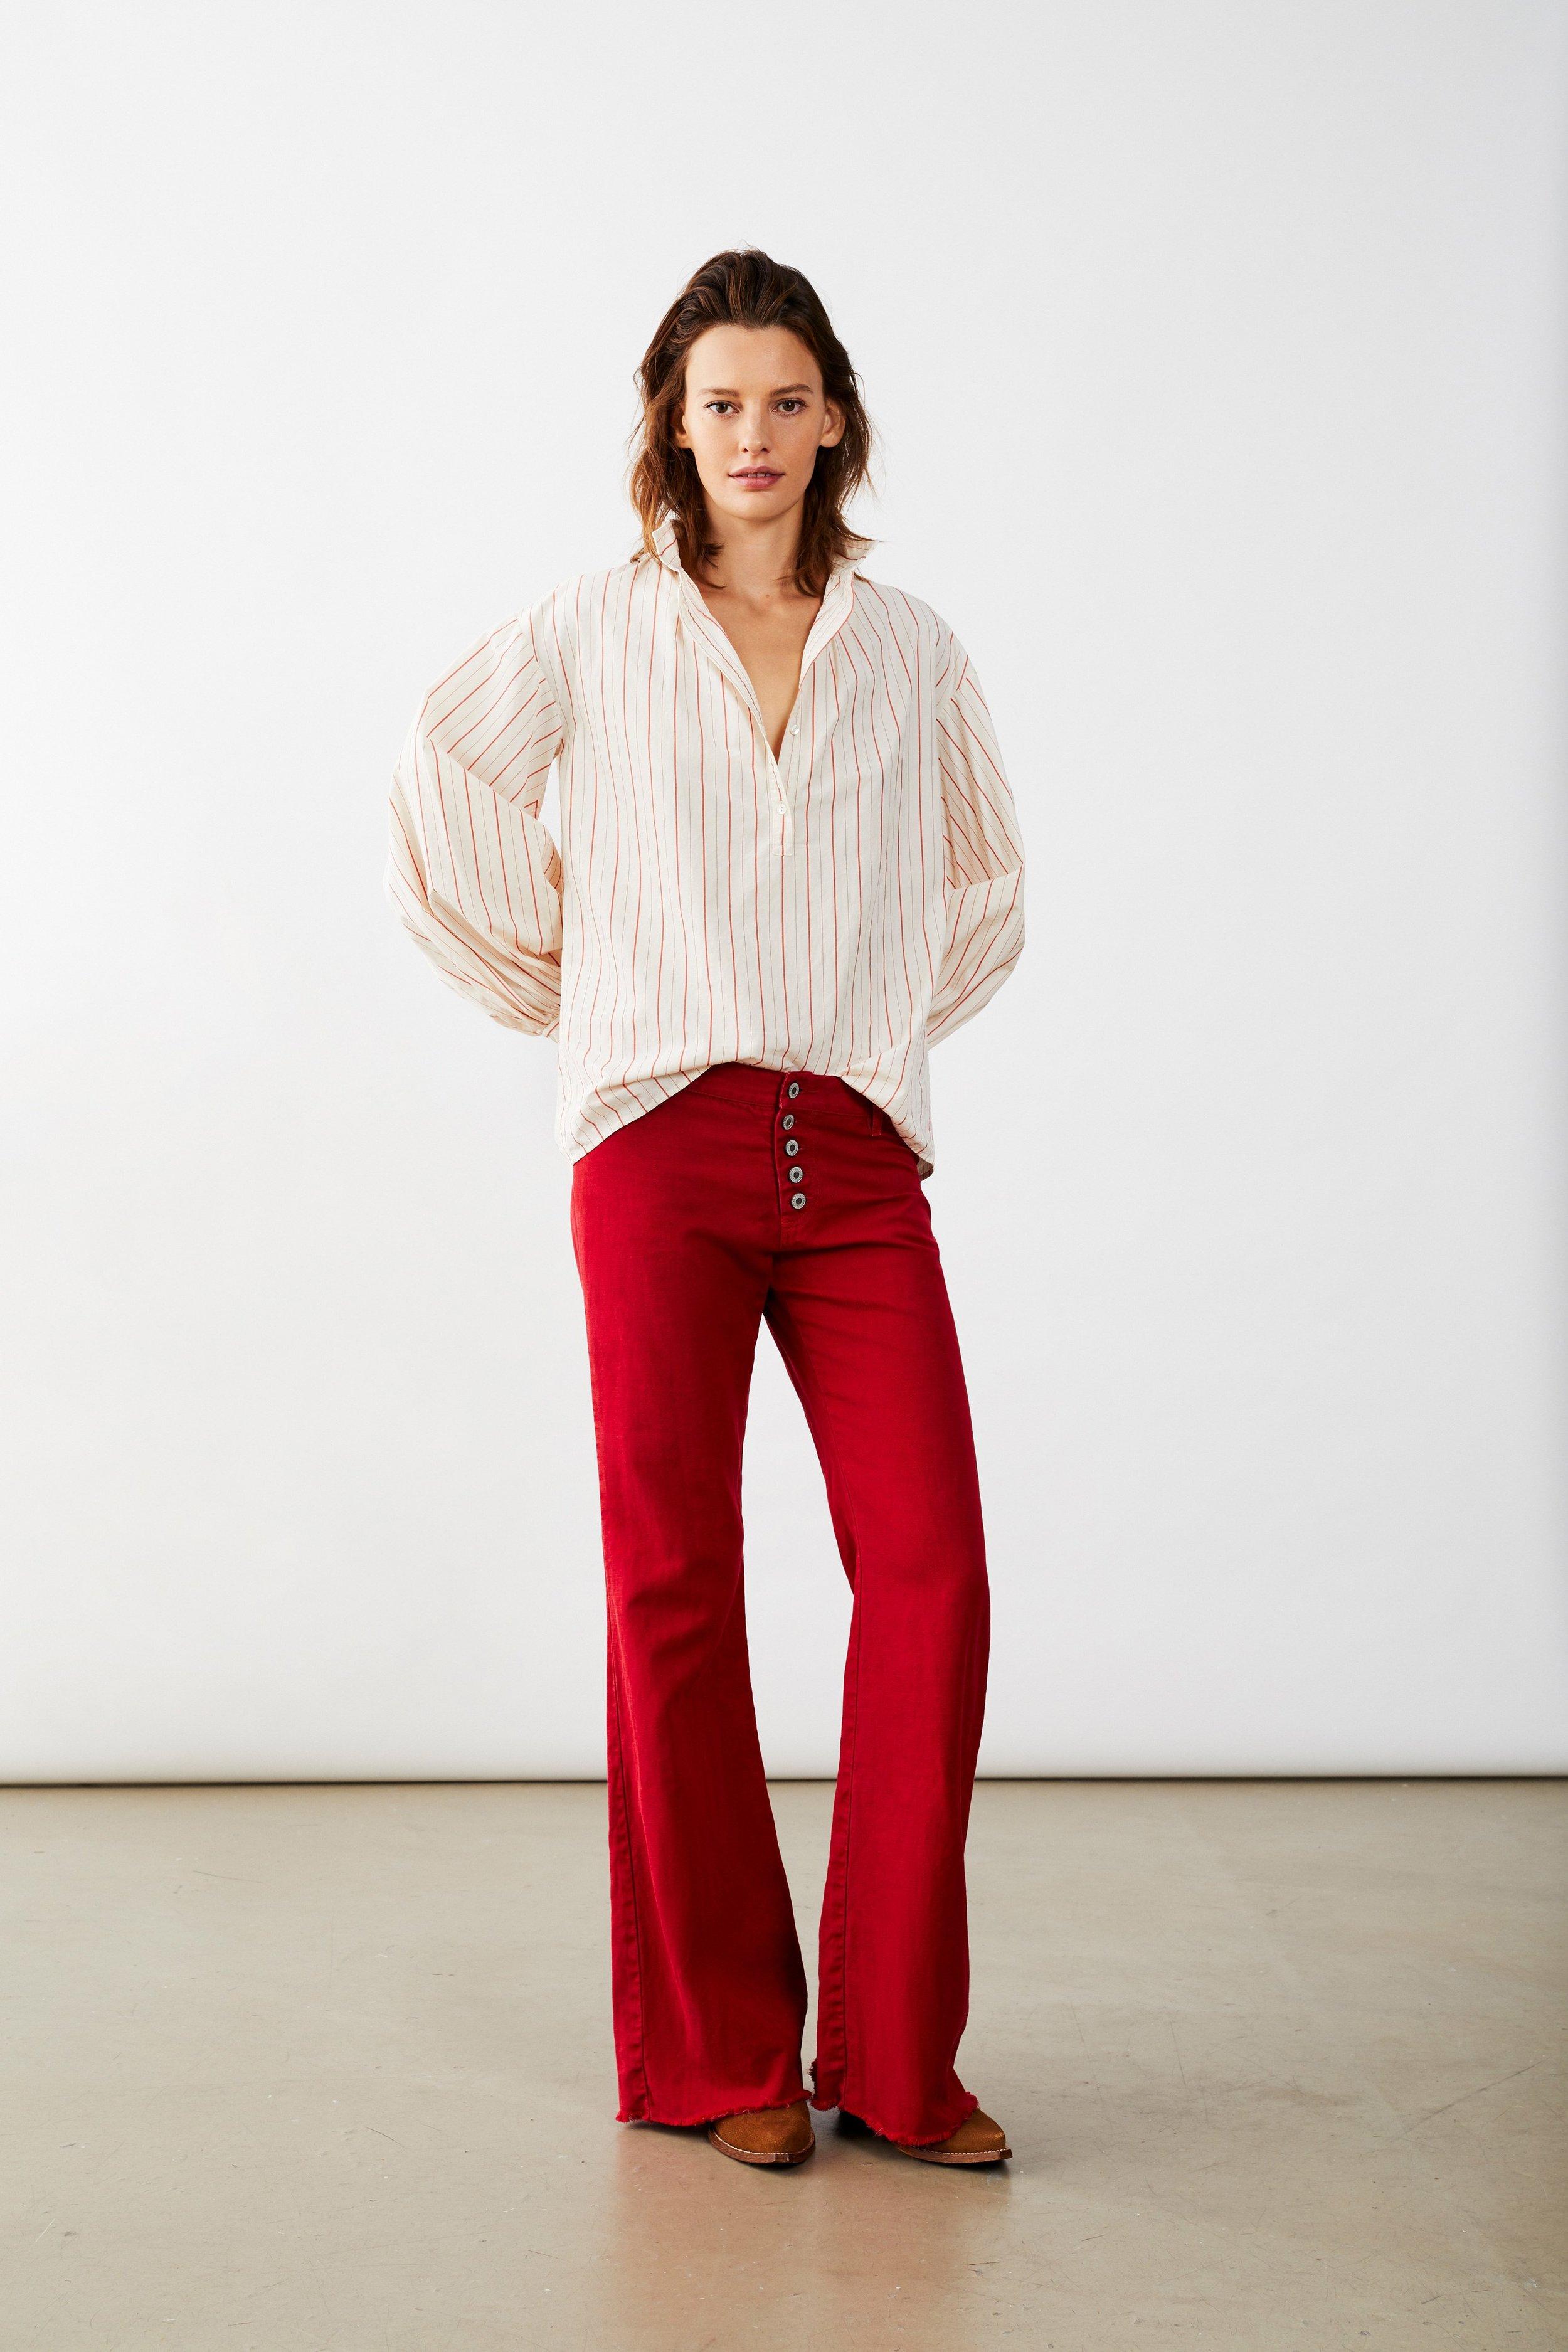 00020-nili-lotan-collection-spring-2019-ready-to-wear.jpg